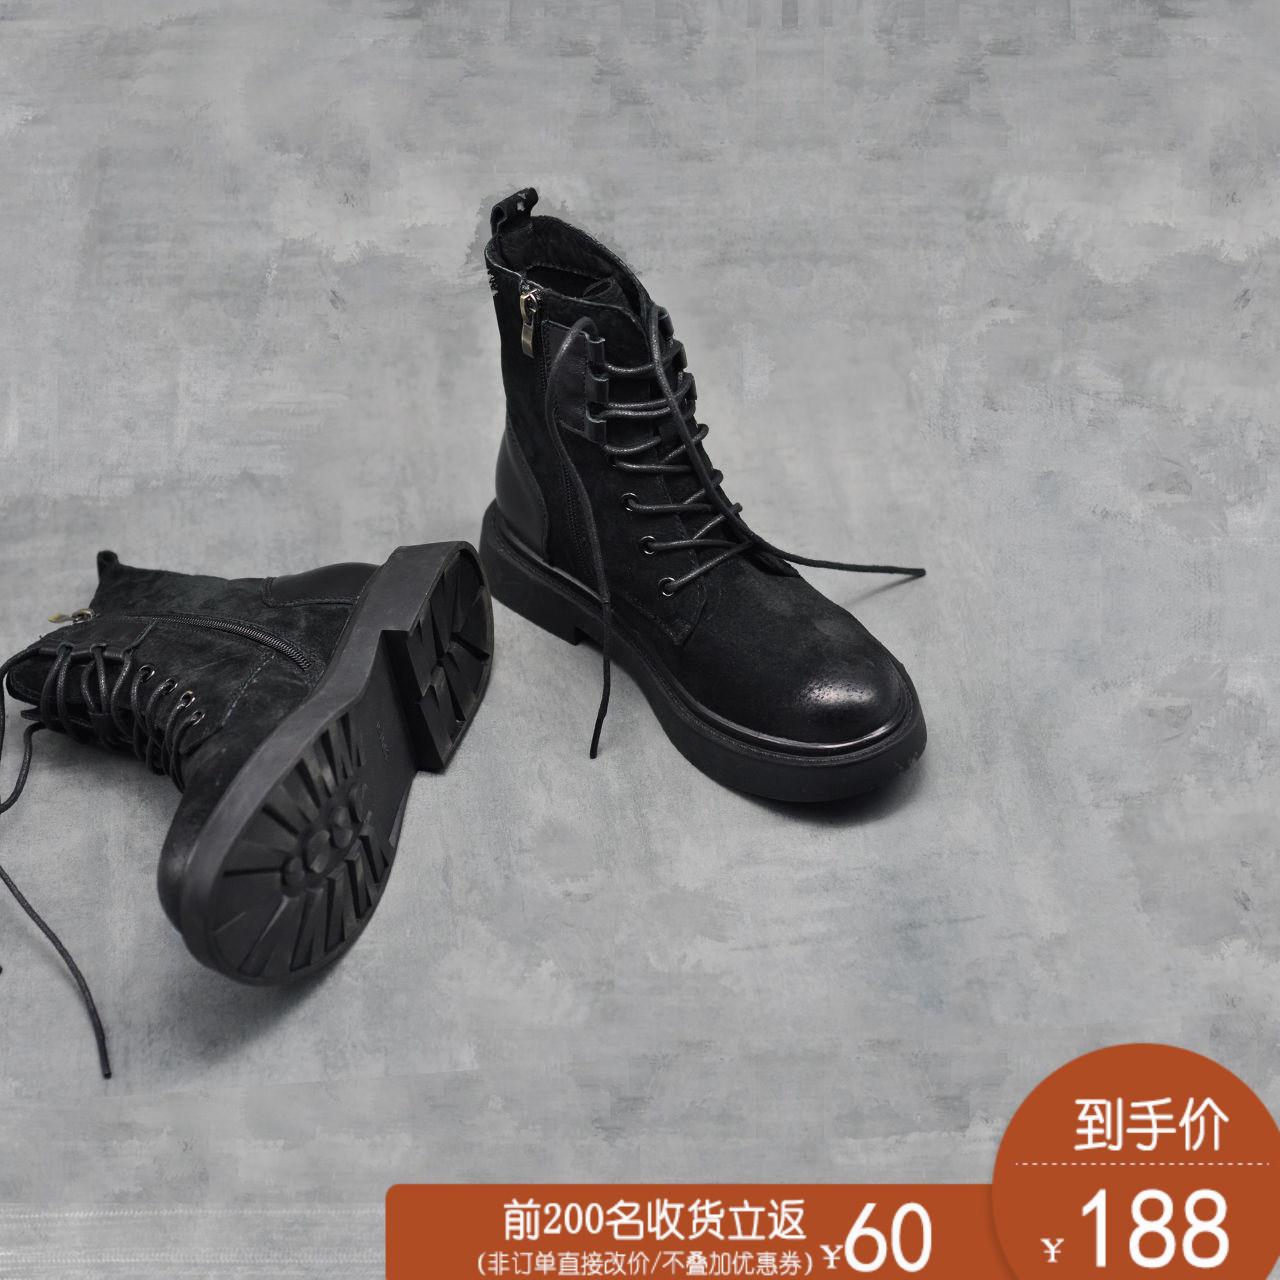 Artmu阿木秋冬新款复古磨砂平跟马丁靴英伦帅气街头机车靴潮